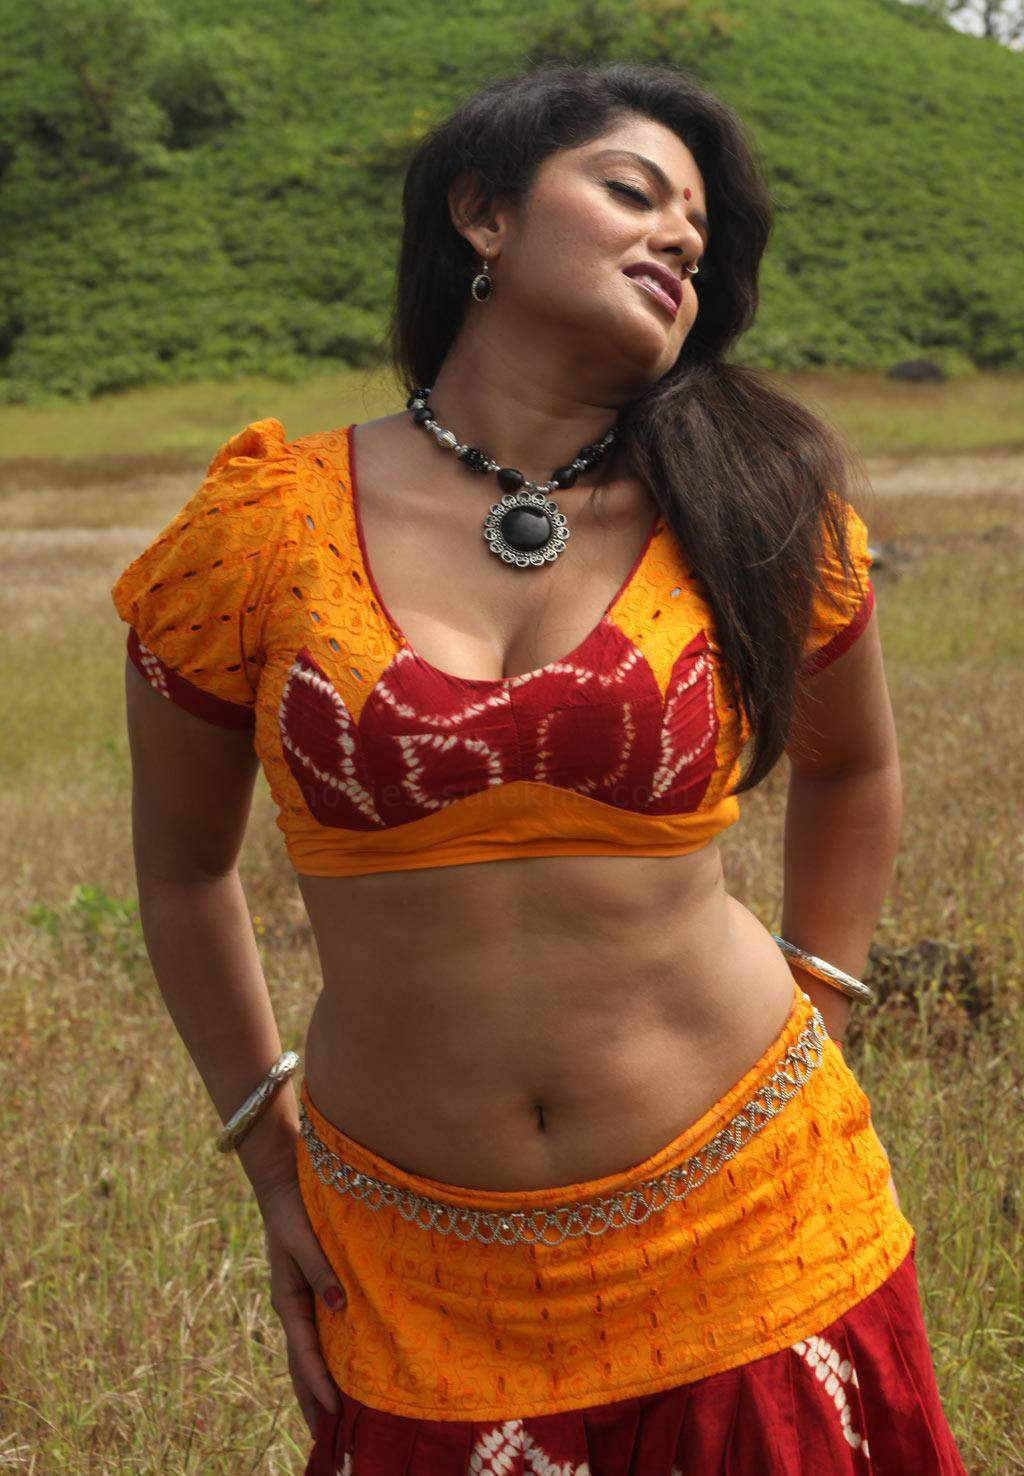 http://4.bp.blogspot.com/-hIYlB0Wb9Ys/TWTP16-jtoI/AAAAAAAABB8/xg04xjhhMro/s1600/hot-tamil-actresses-swathi-verma-from+tamil+movie-devathasiyin-kadhai-desktop-wallpapers_hottamilactresseshub.blogspot.com_000.jpg